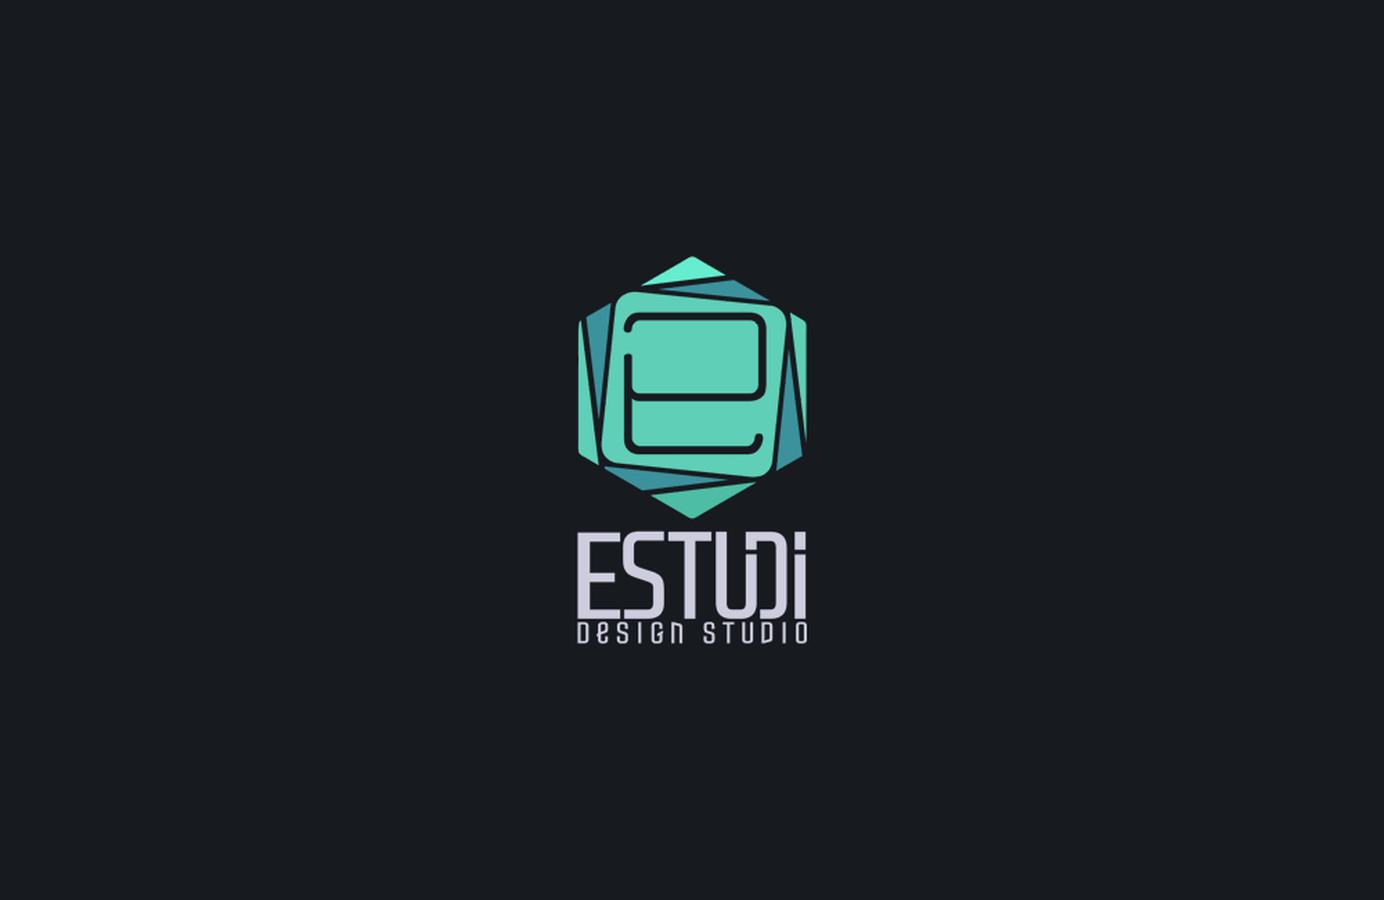 www.estudi.lt Interjero dizaino studijos logotipas